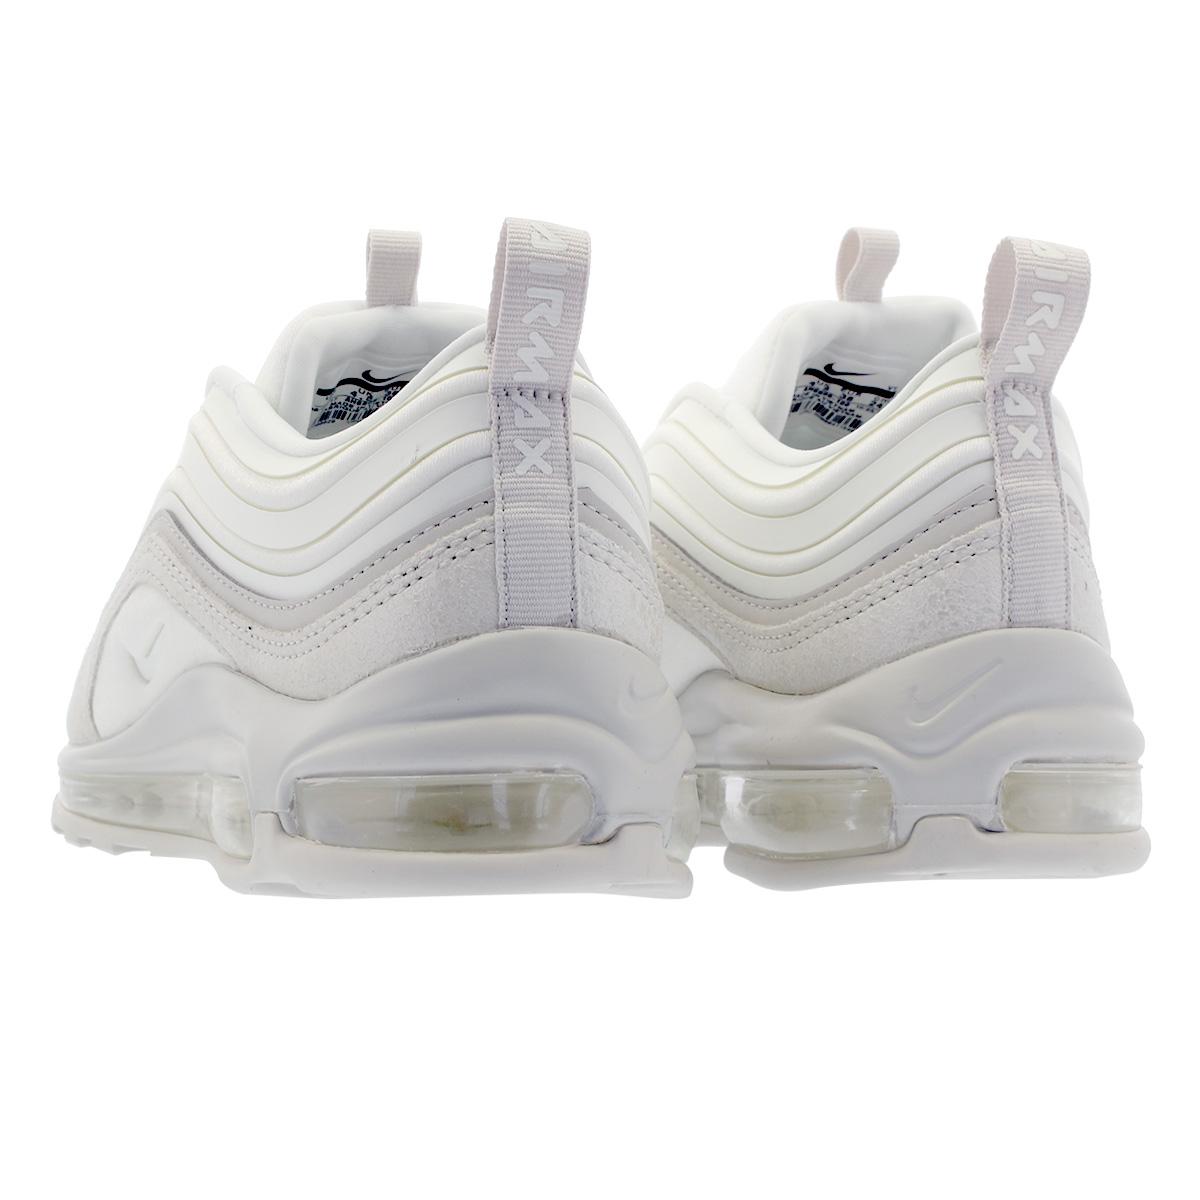 NIKE WMNS AIR MAX 97 UL '17 SE Nike women Air Max ultra '17 SUMMIT WHITEMETALLIC SUMMIT WHITELIGHT BONE ah6806 100